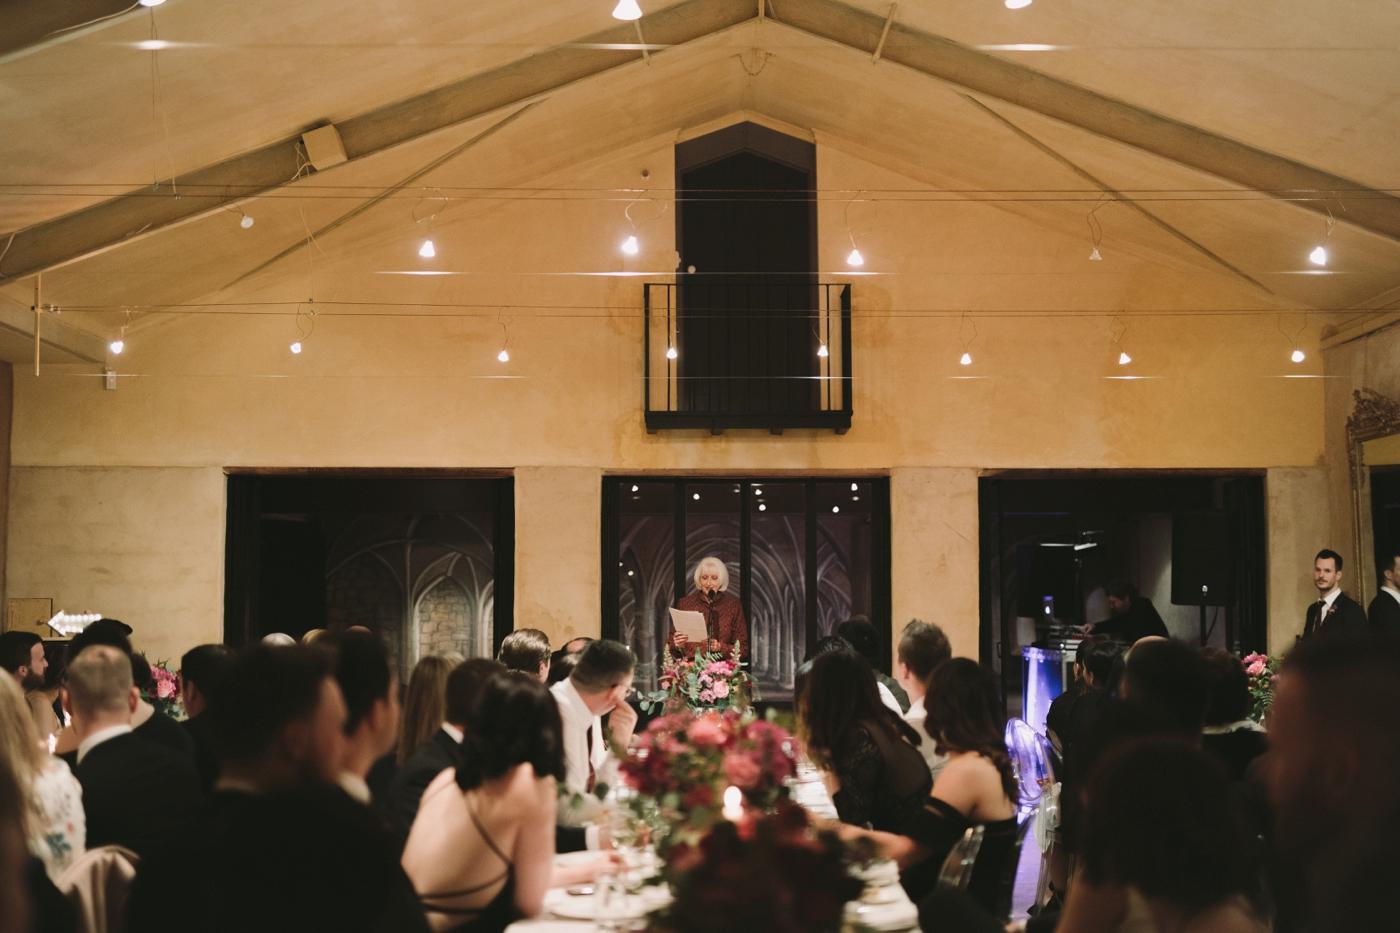 Adelaide Wedding Photographer - Al Ru Farm Wedding in Adelaide - Natural Wedding Photography Australia - www.katherineschultzphotography.com - Todd & Rachel_0059.jpg